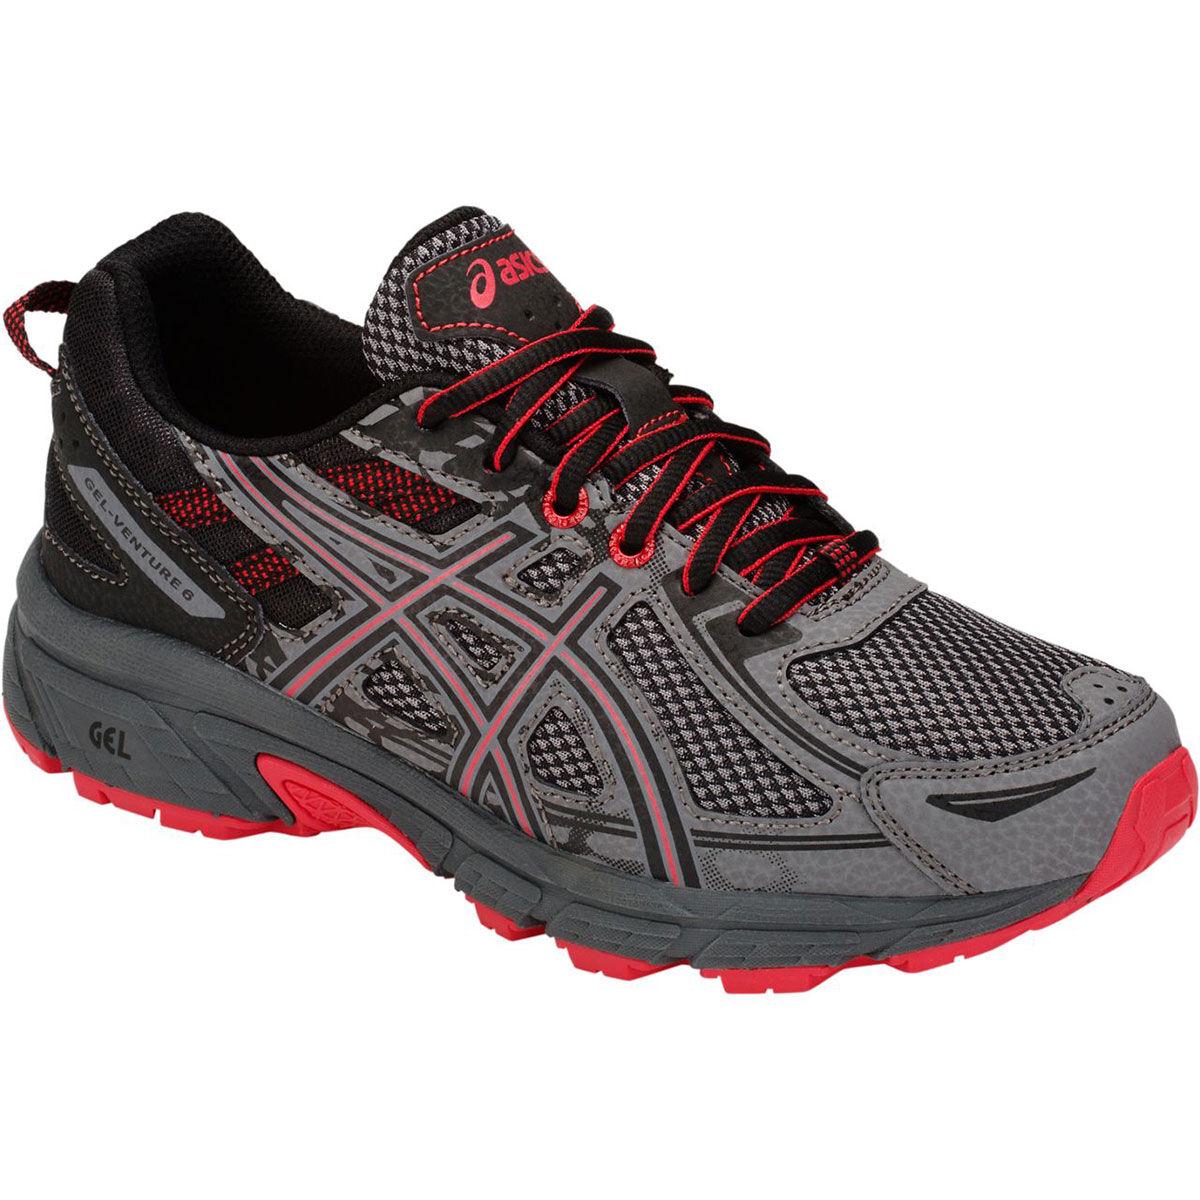 Asics Boys' Gel-Venture 6 Gs Running Shoes